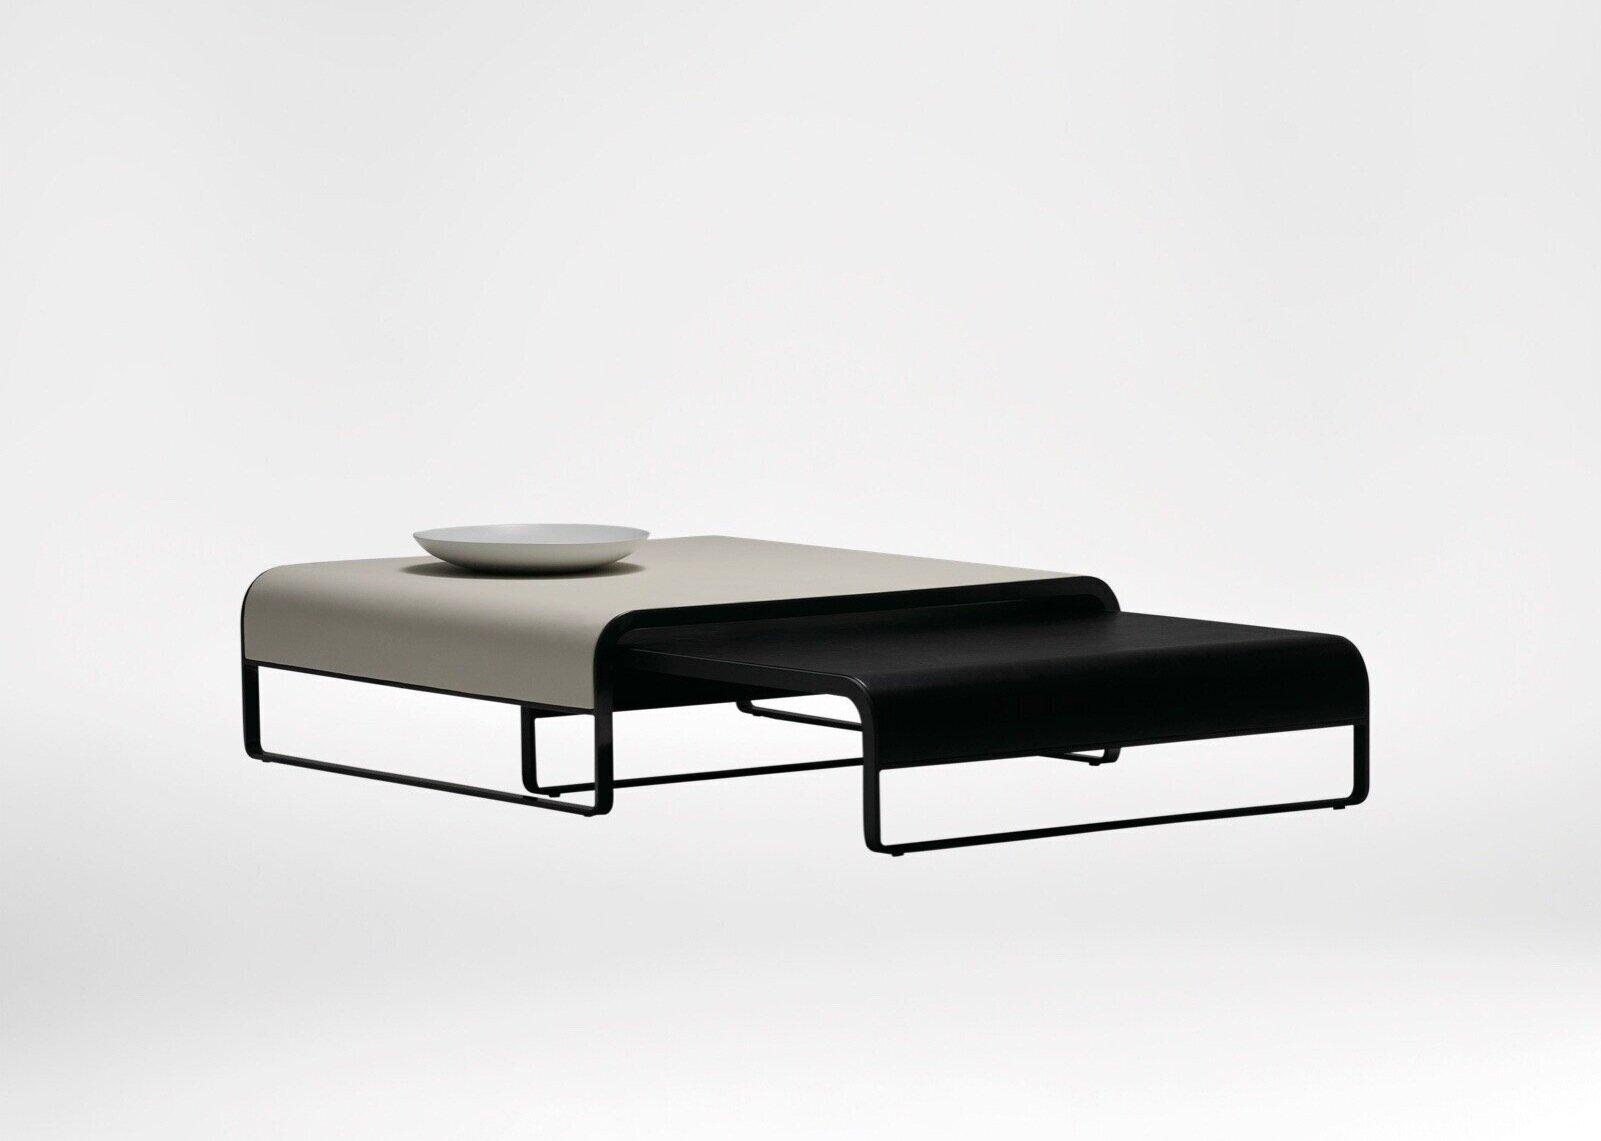 Era coffee table - Gentle organic curve juxtaposes stylishly with the slick black steel.